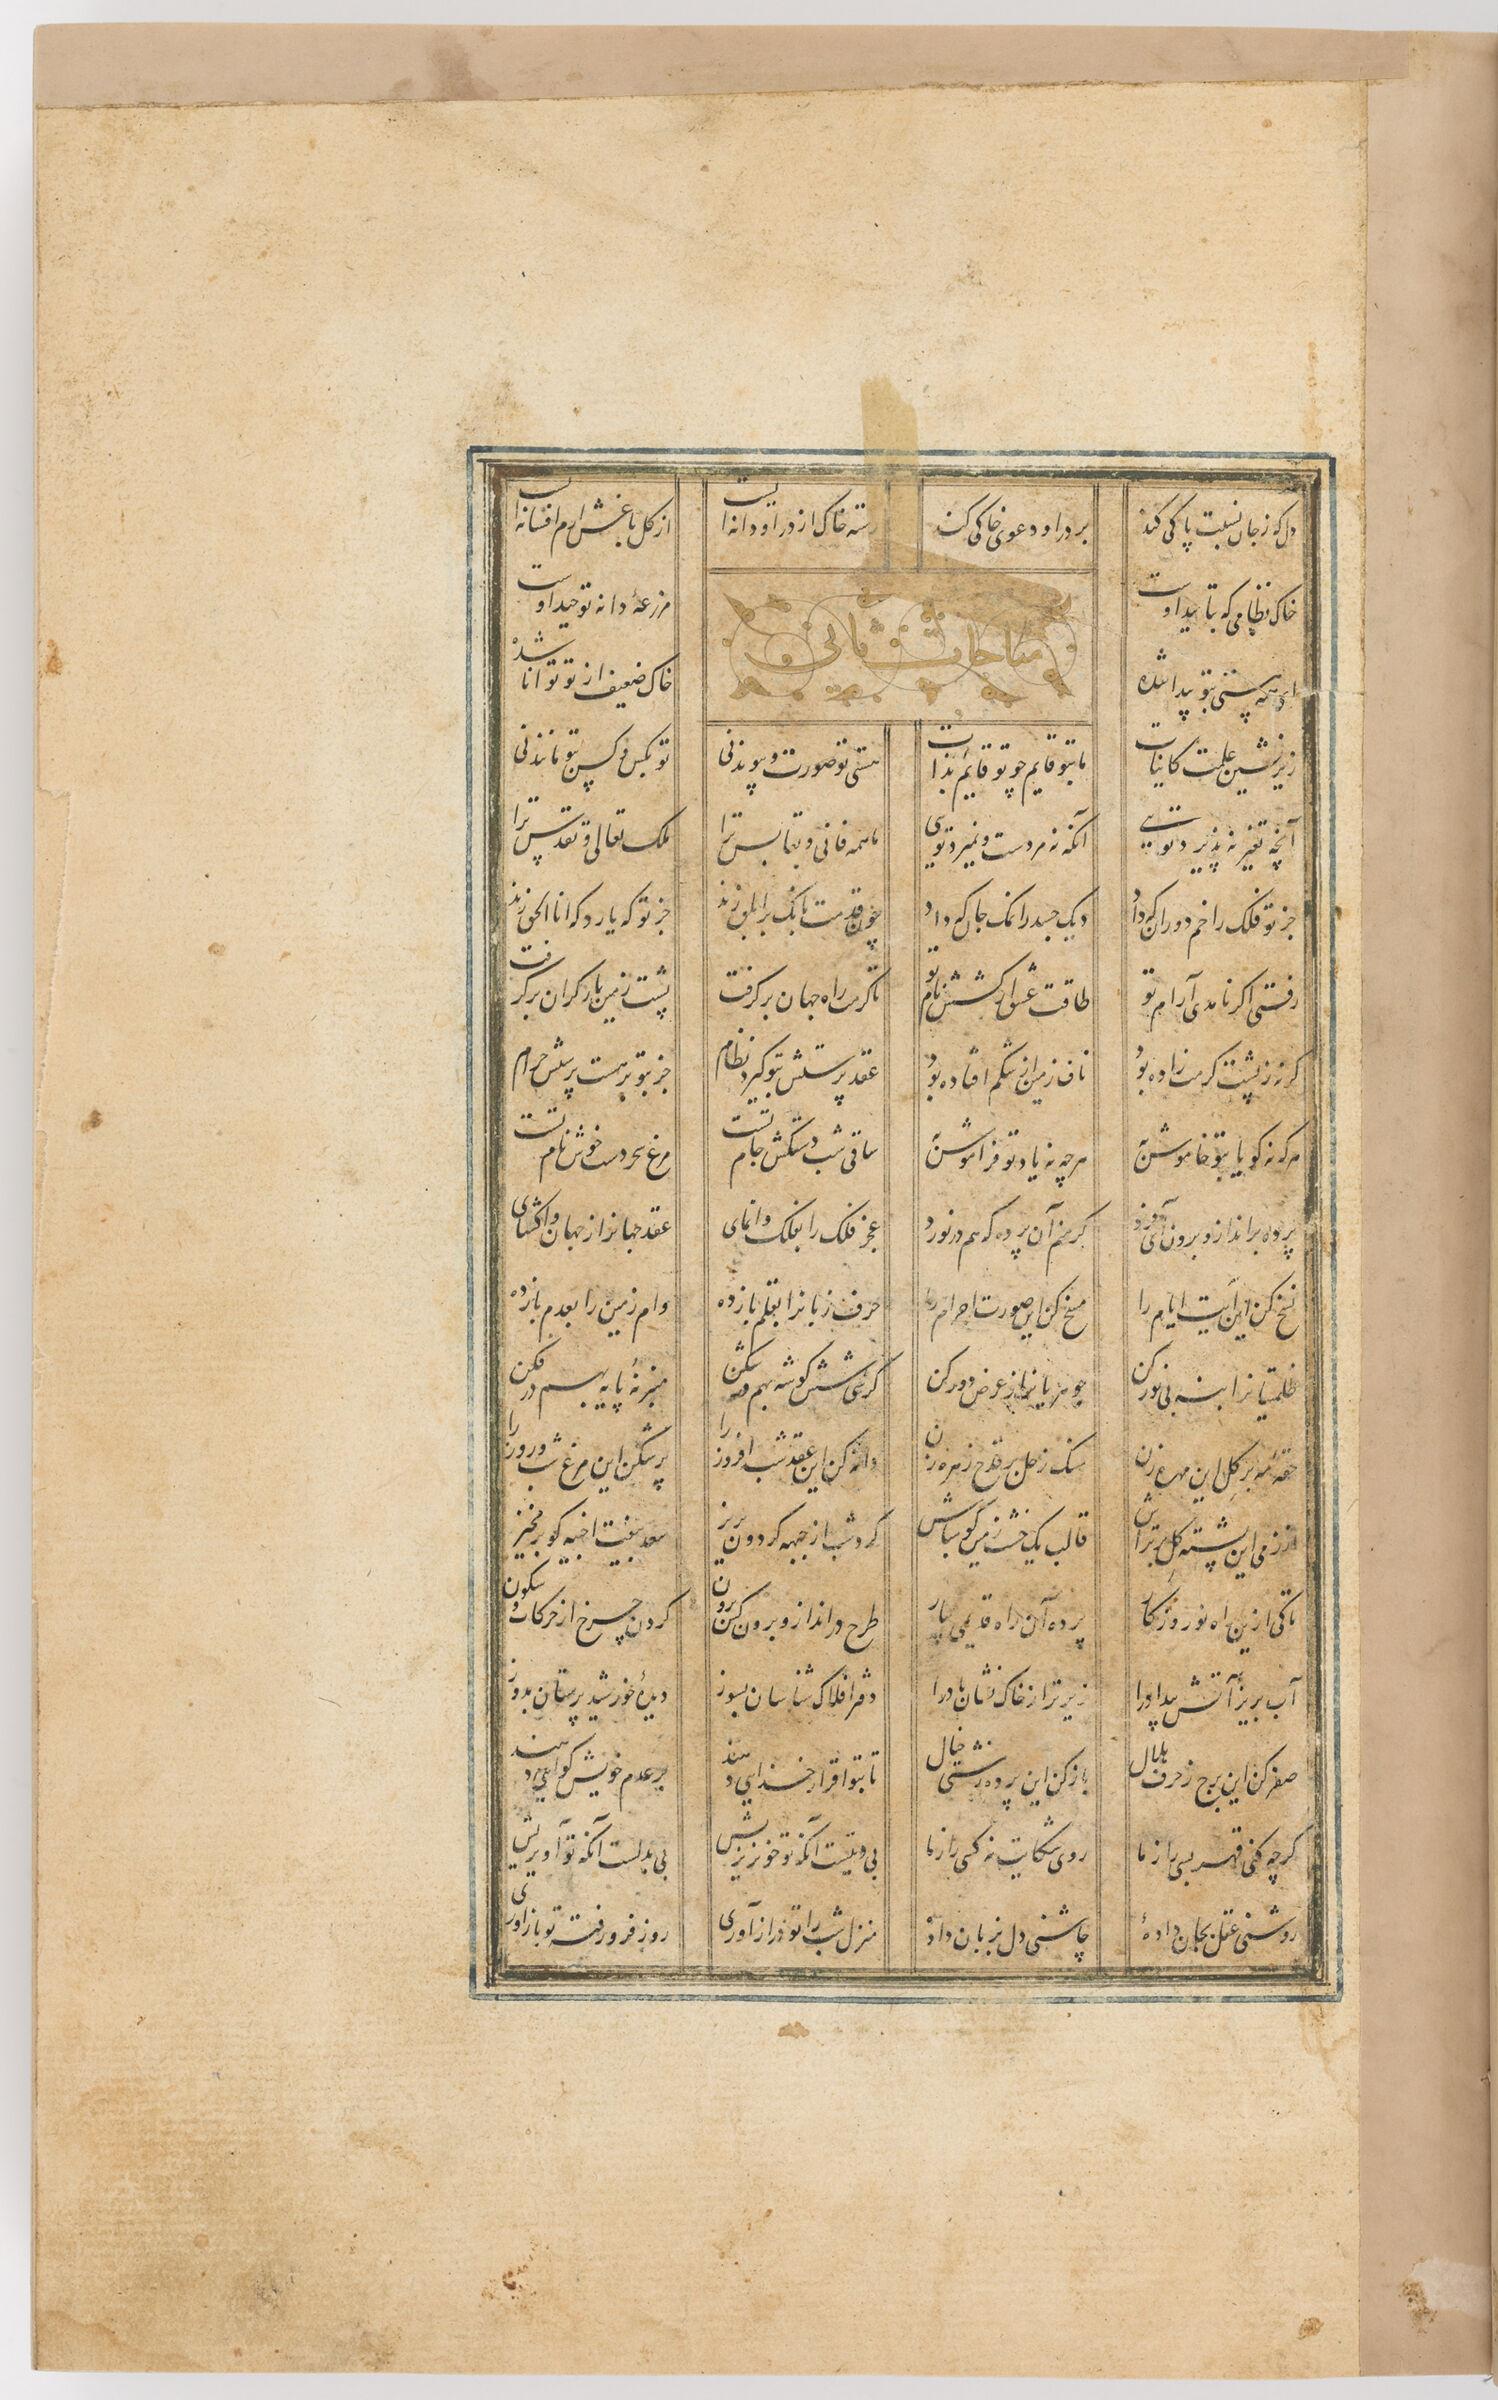 Text Folio (Text Recto; Text Verso Of Folio 4), From A Manuscript Of The Khamsa By Nizami